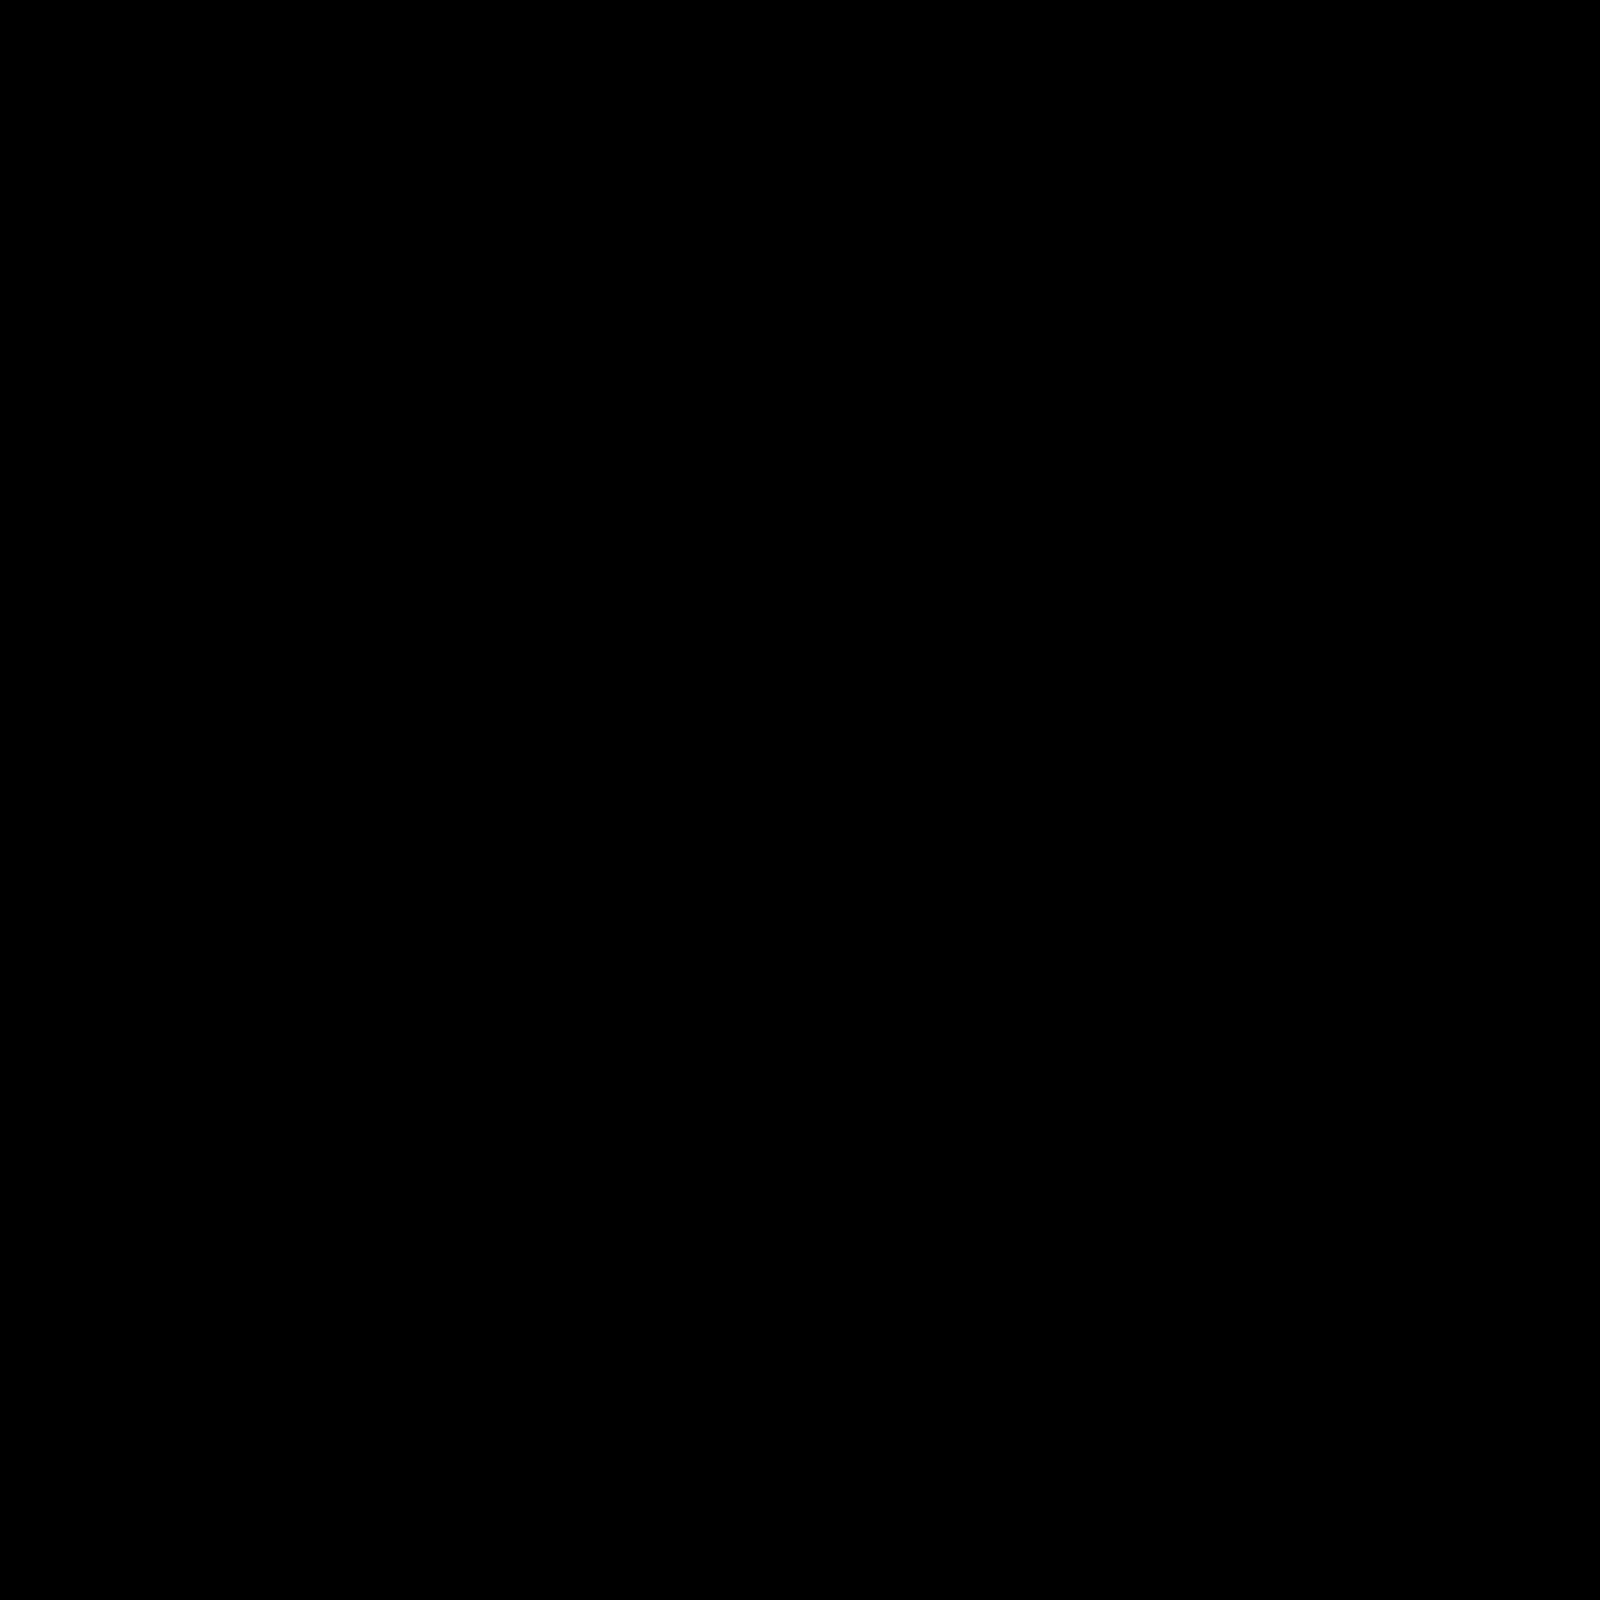 Infant Massage Filled icon